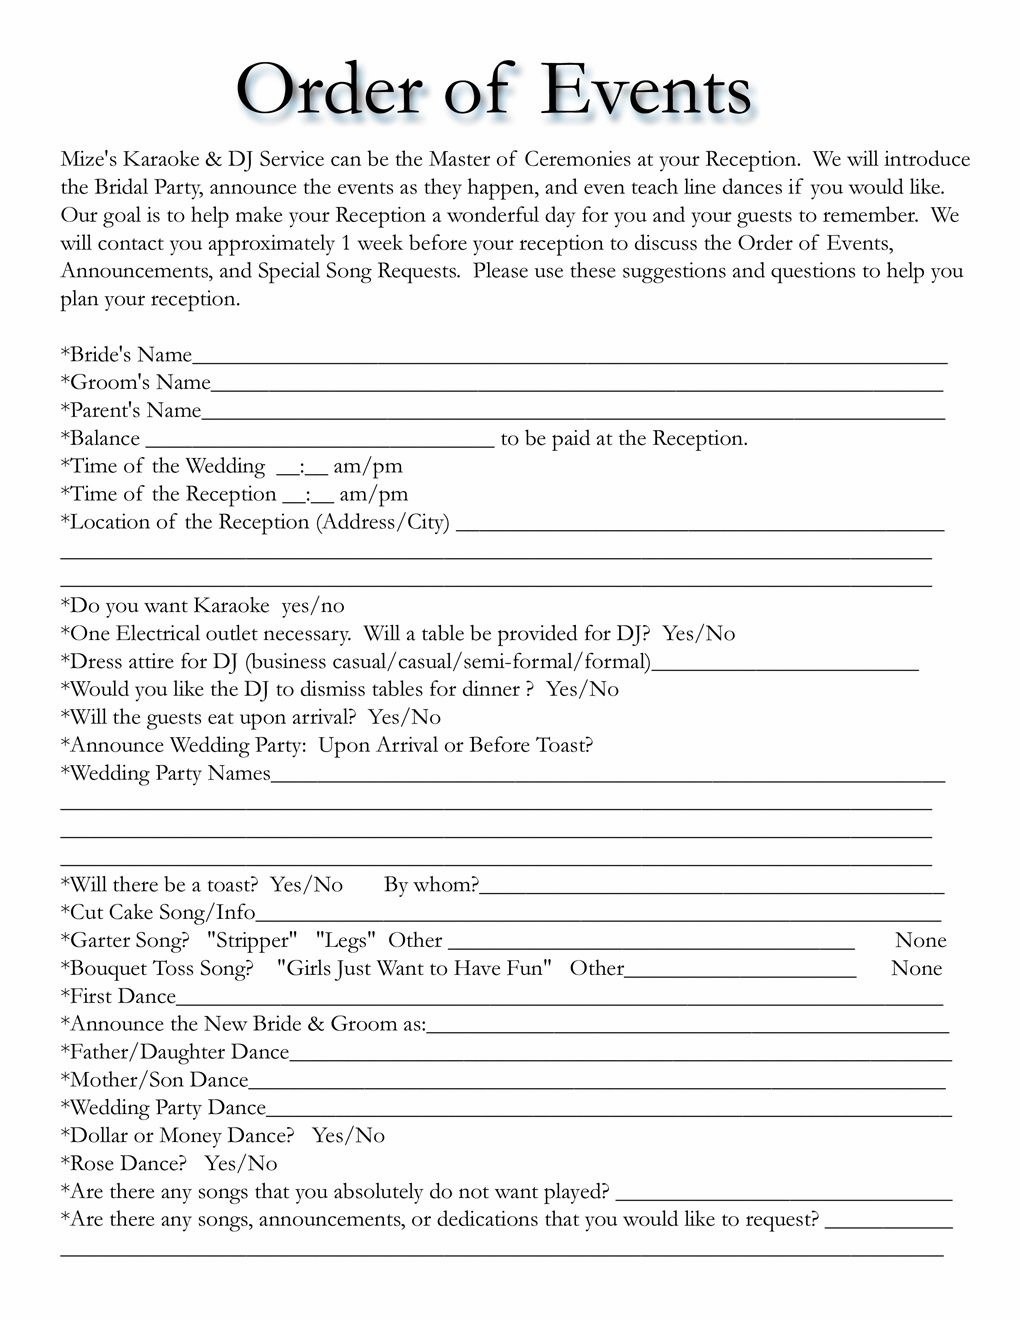 Wedding Reception Agenda Template The Five Common  Nyfamilydigital intended for Wedding Agenda Template